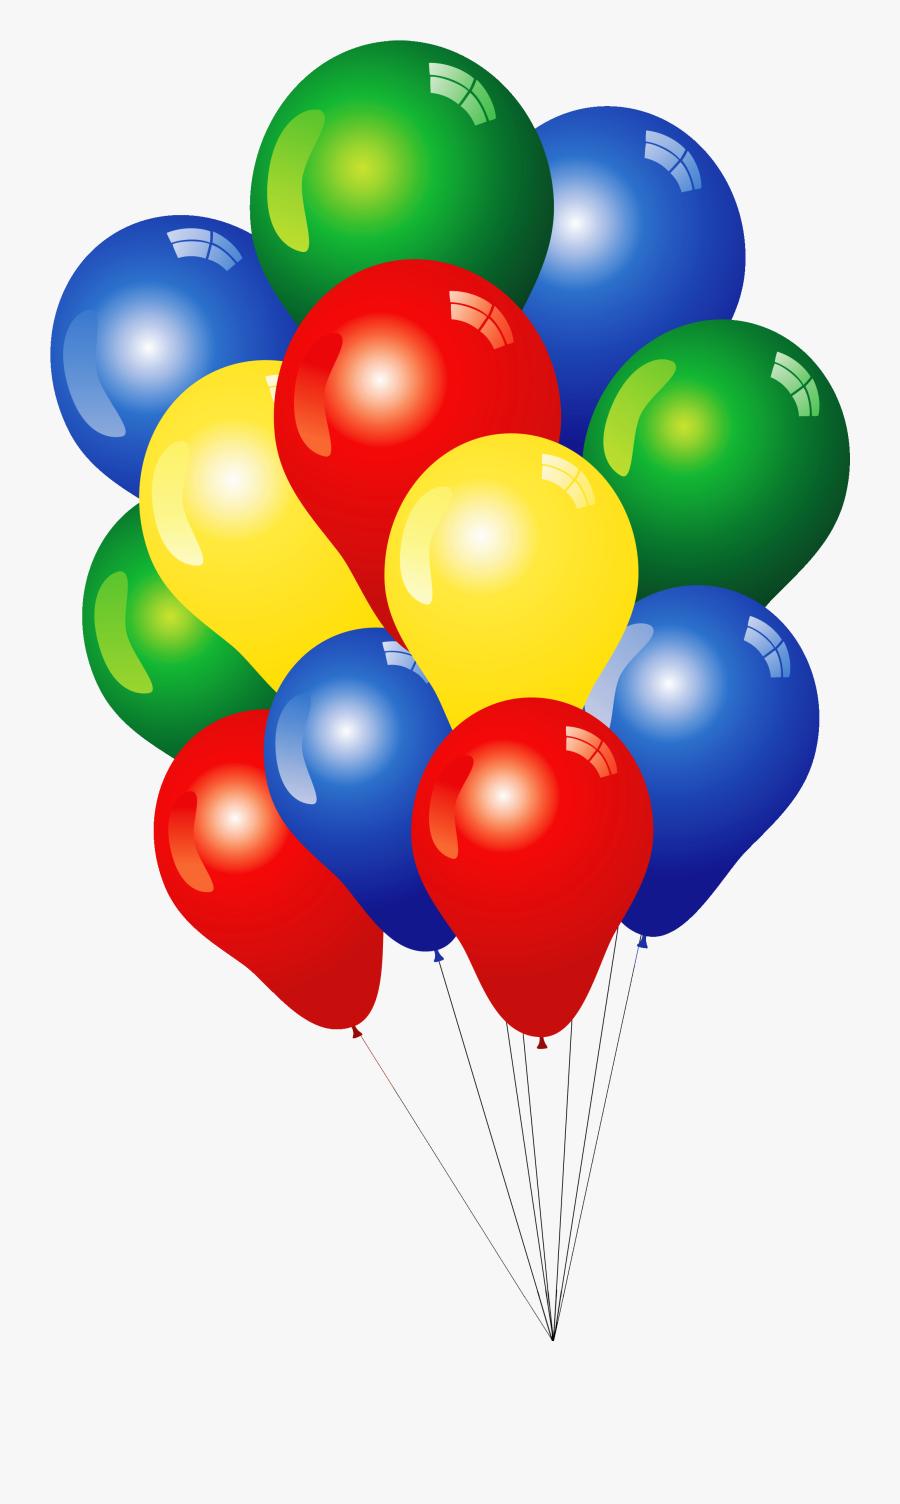 Ballon Clipart Balloon Clipart Free Images The Cliparts - Balloons Clipart, Transparent Clipart